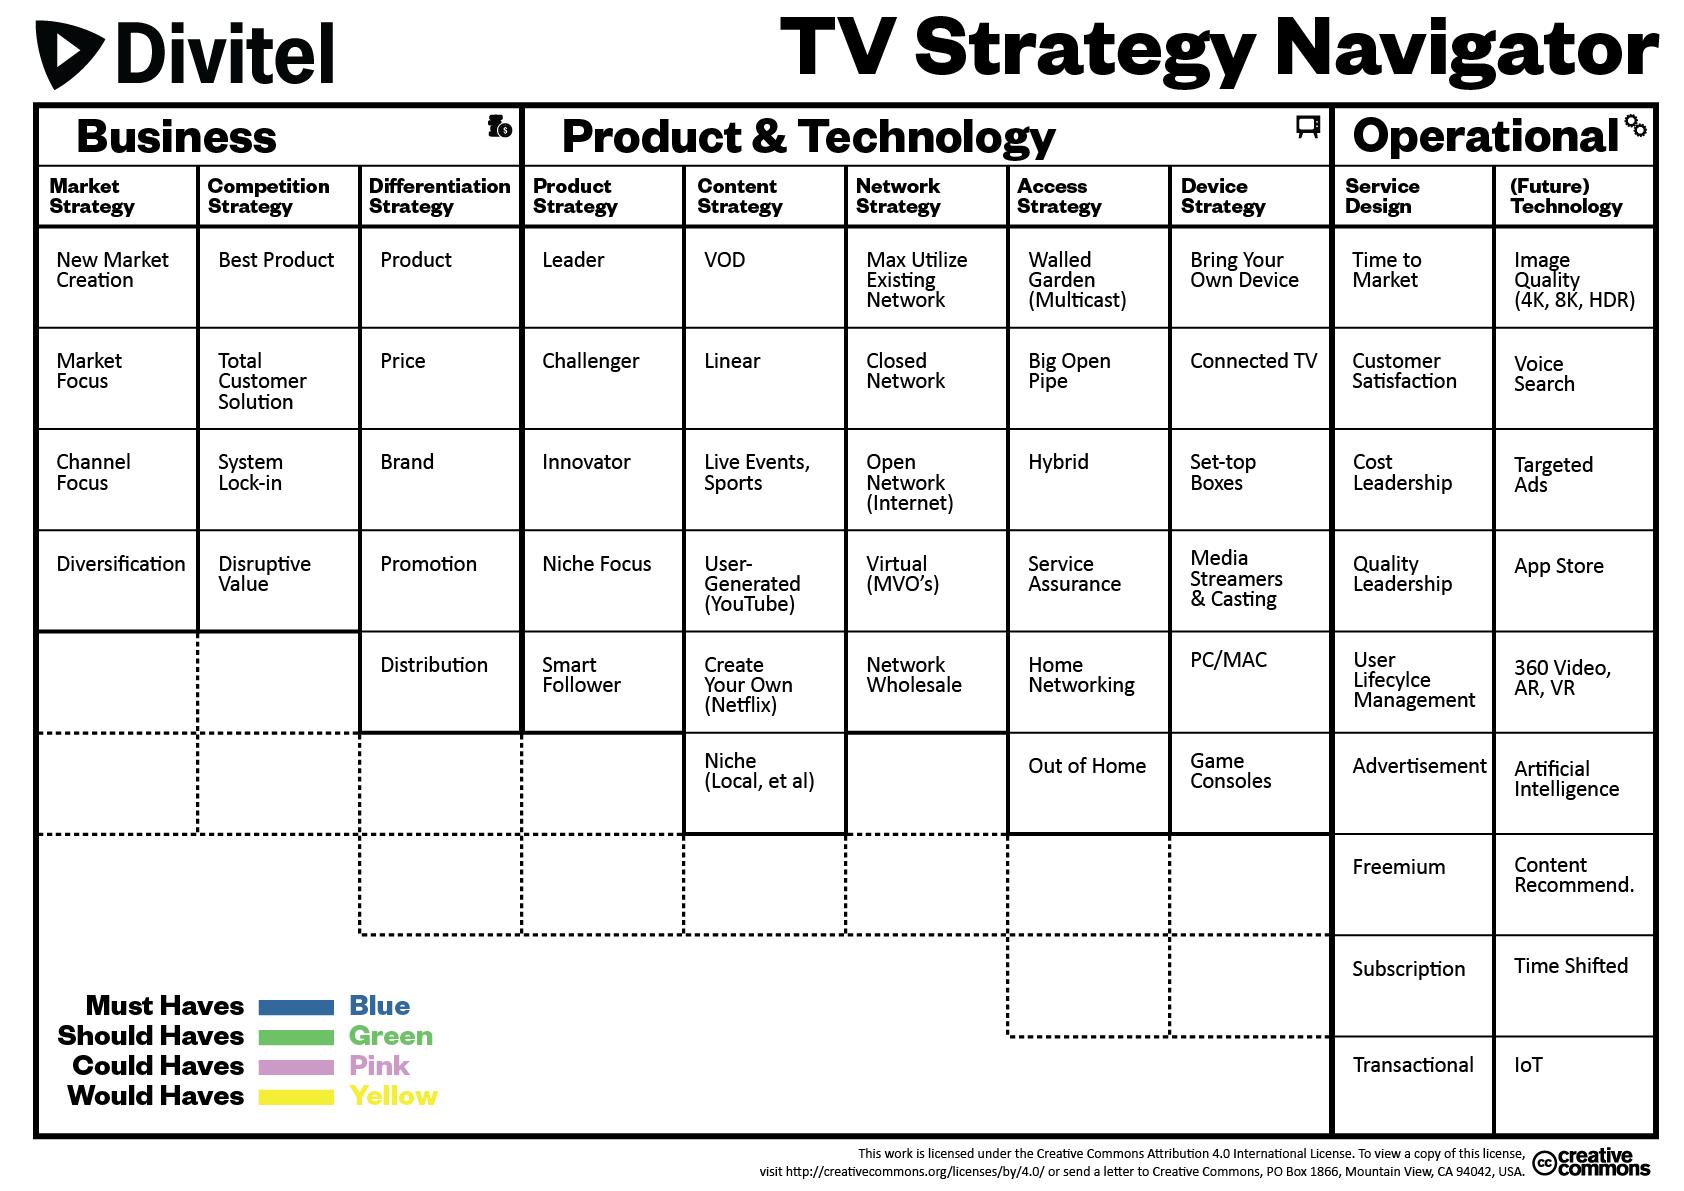 Divitel TV Strategy Navigator